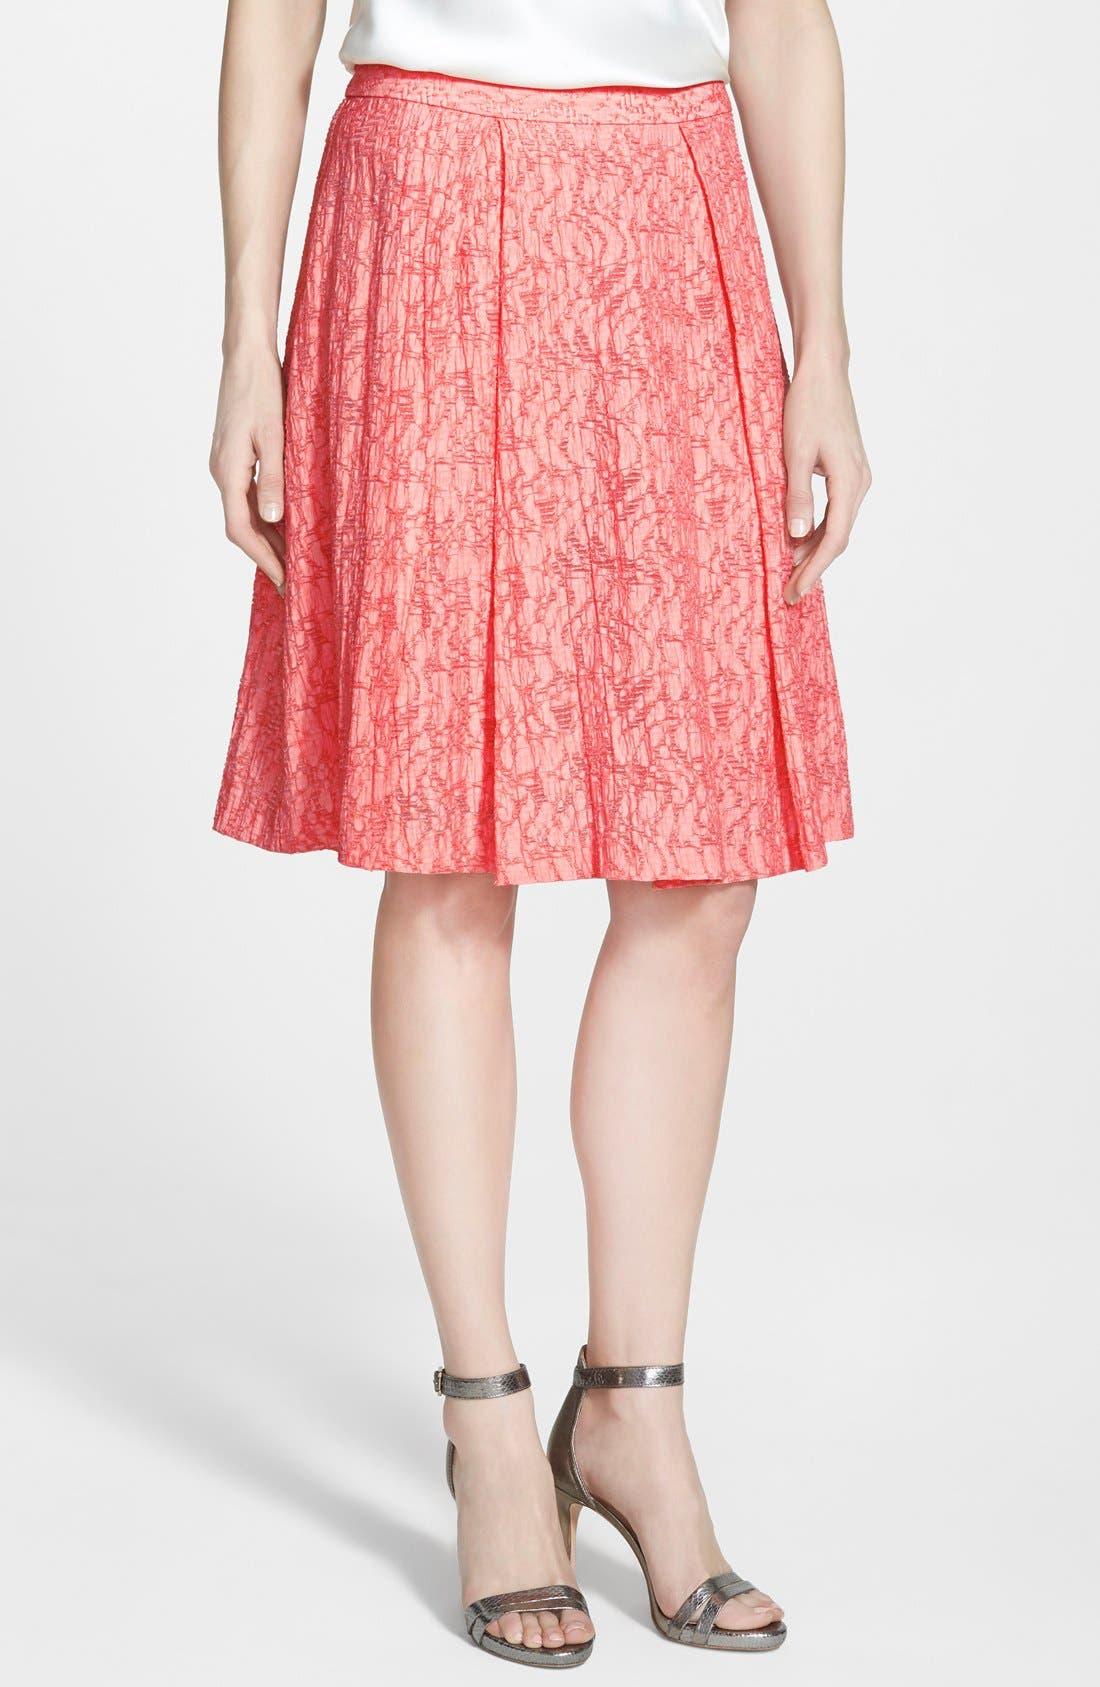 Alternate Image 1 Selected - Vince Camuto Pleated A-Line Skirt (Regular & Petite)